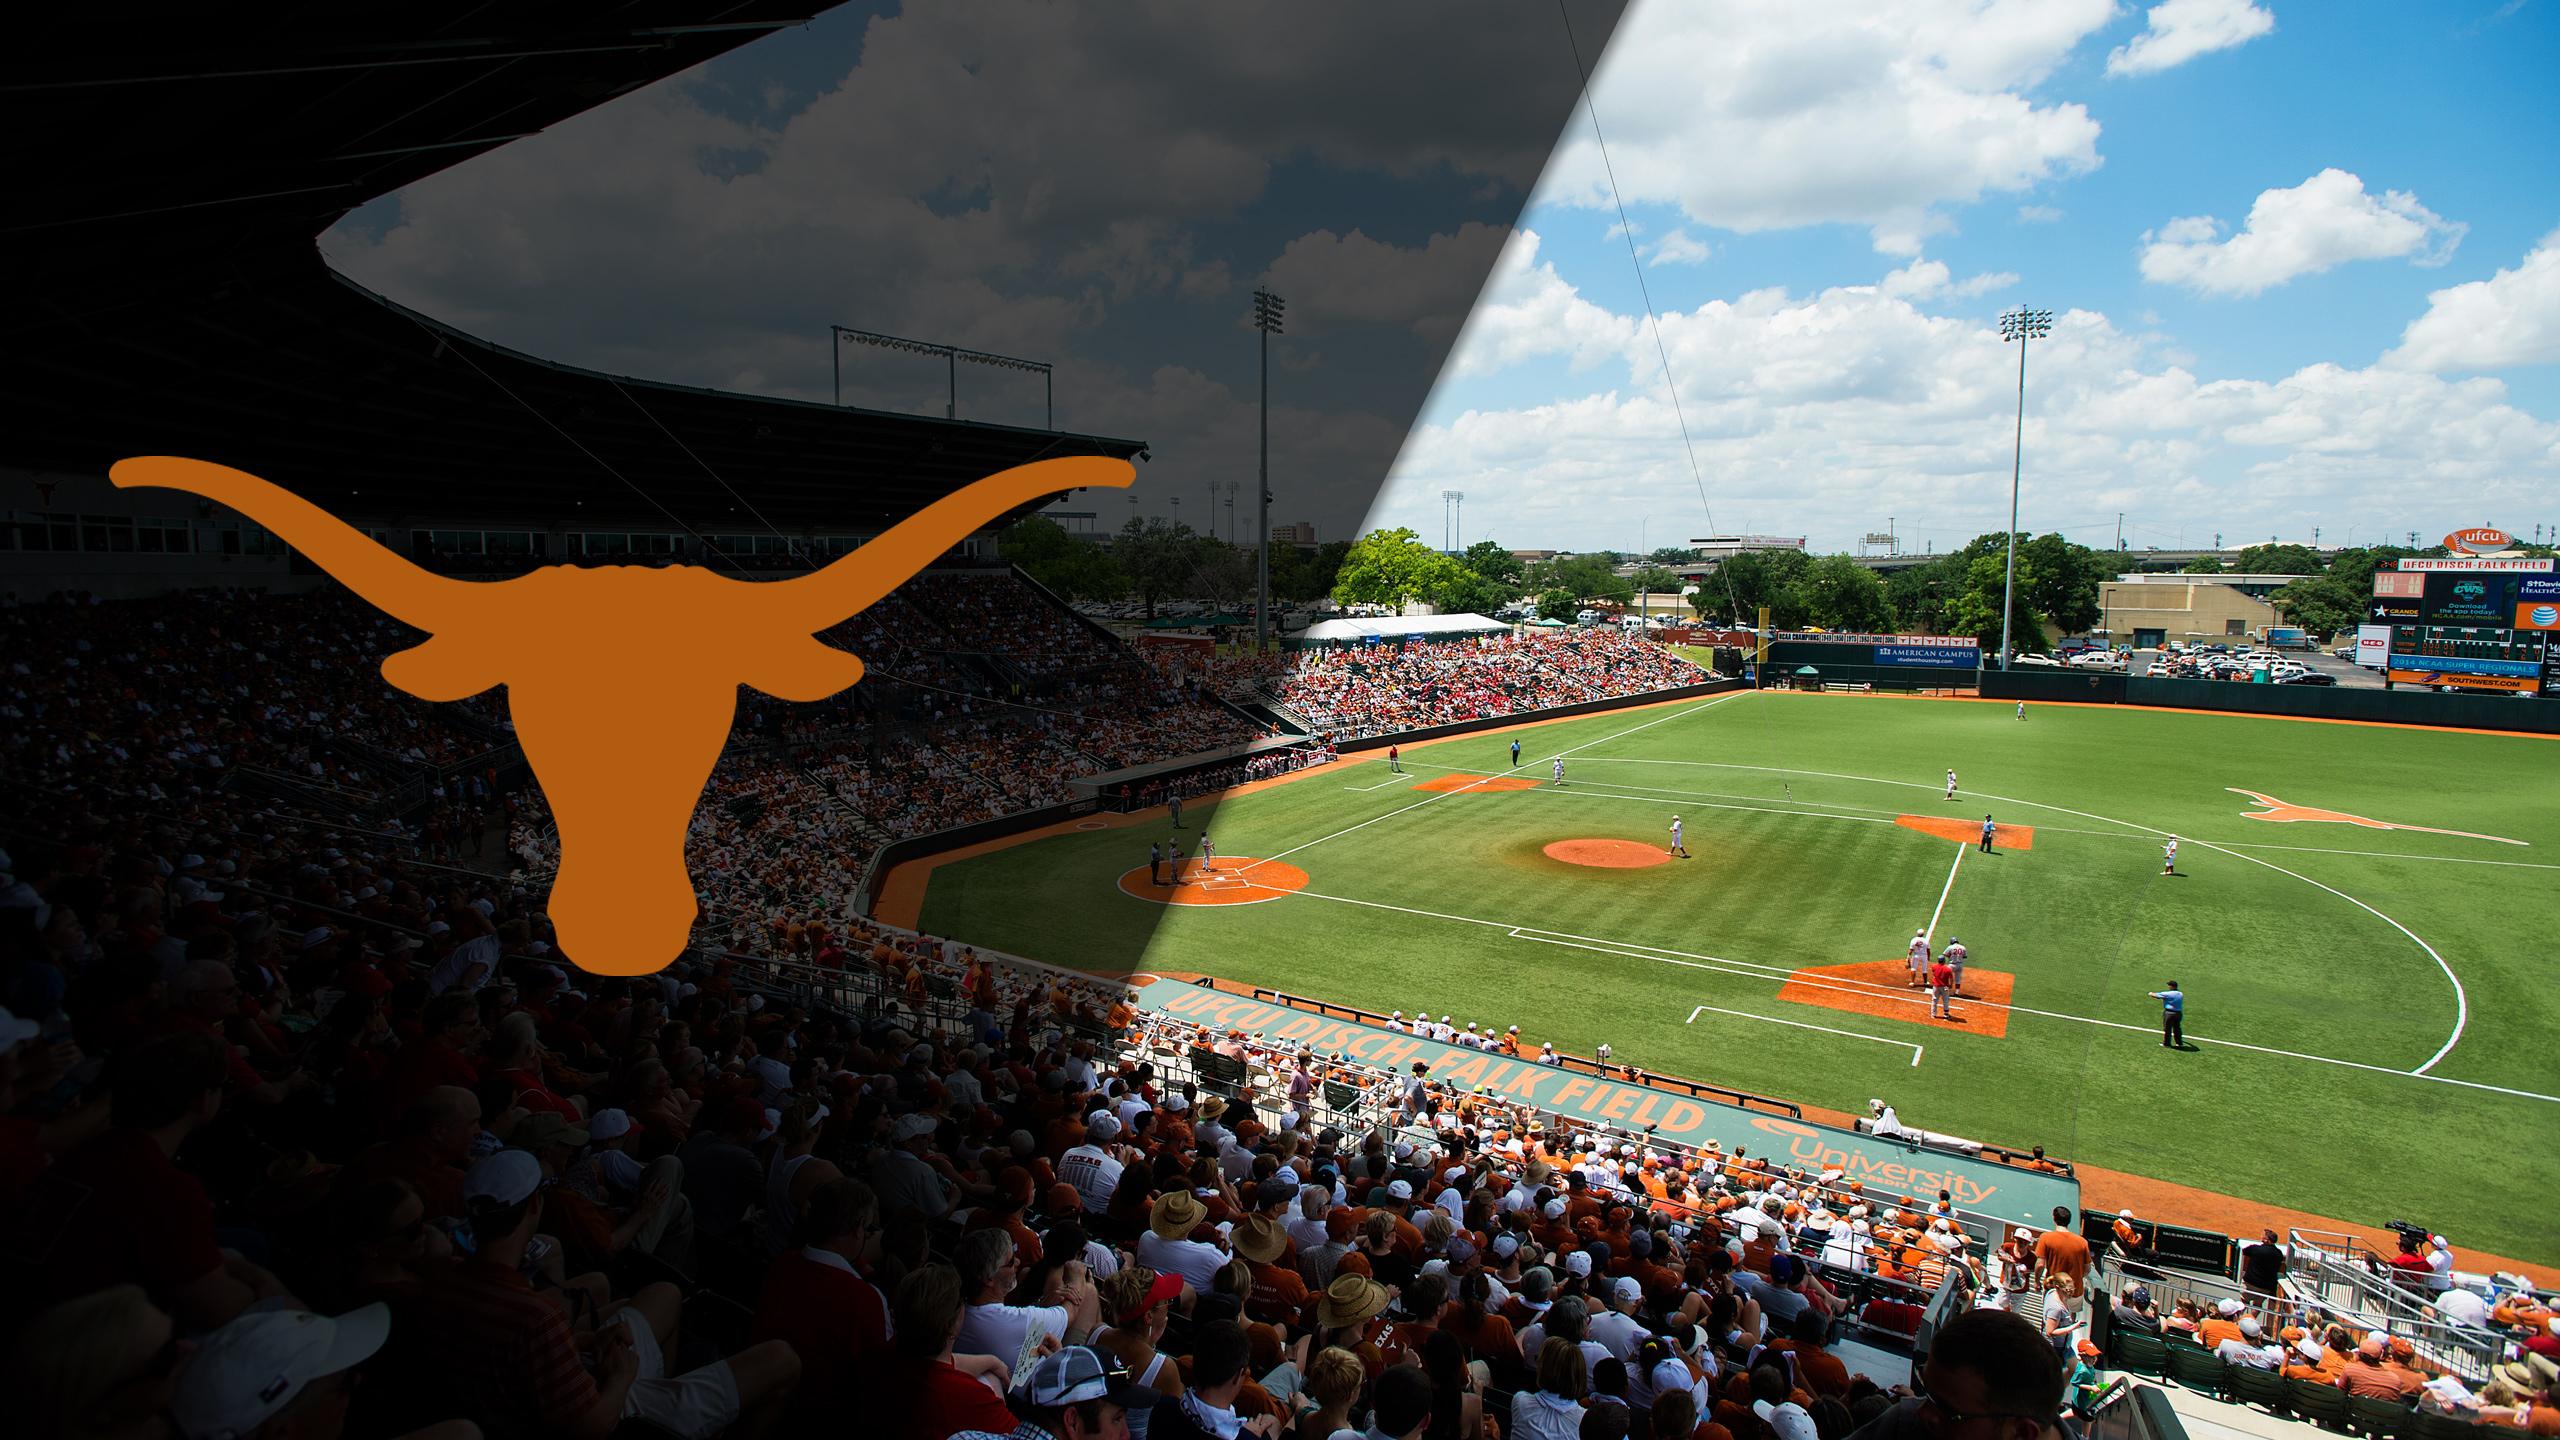 Texas Baseball